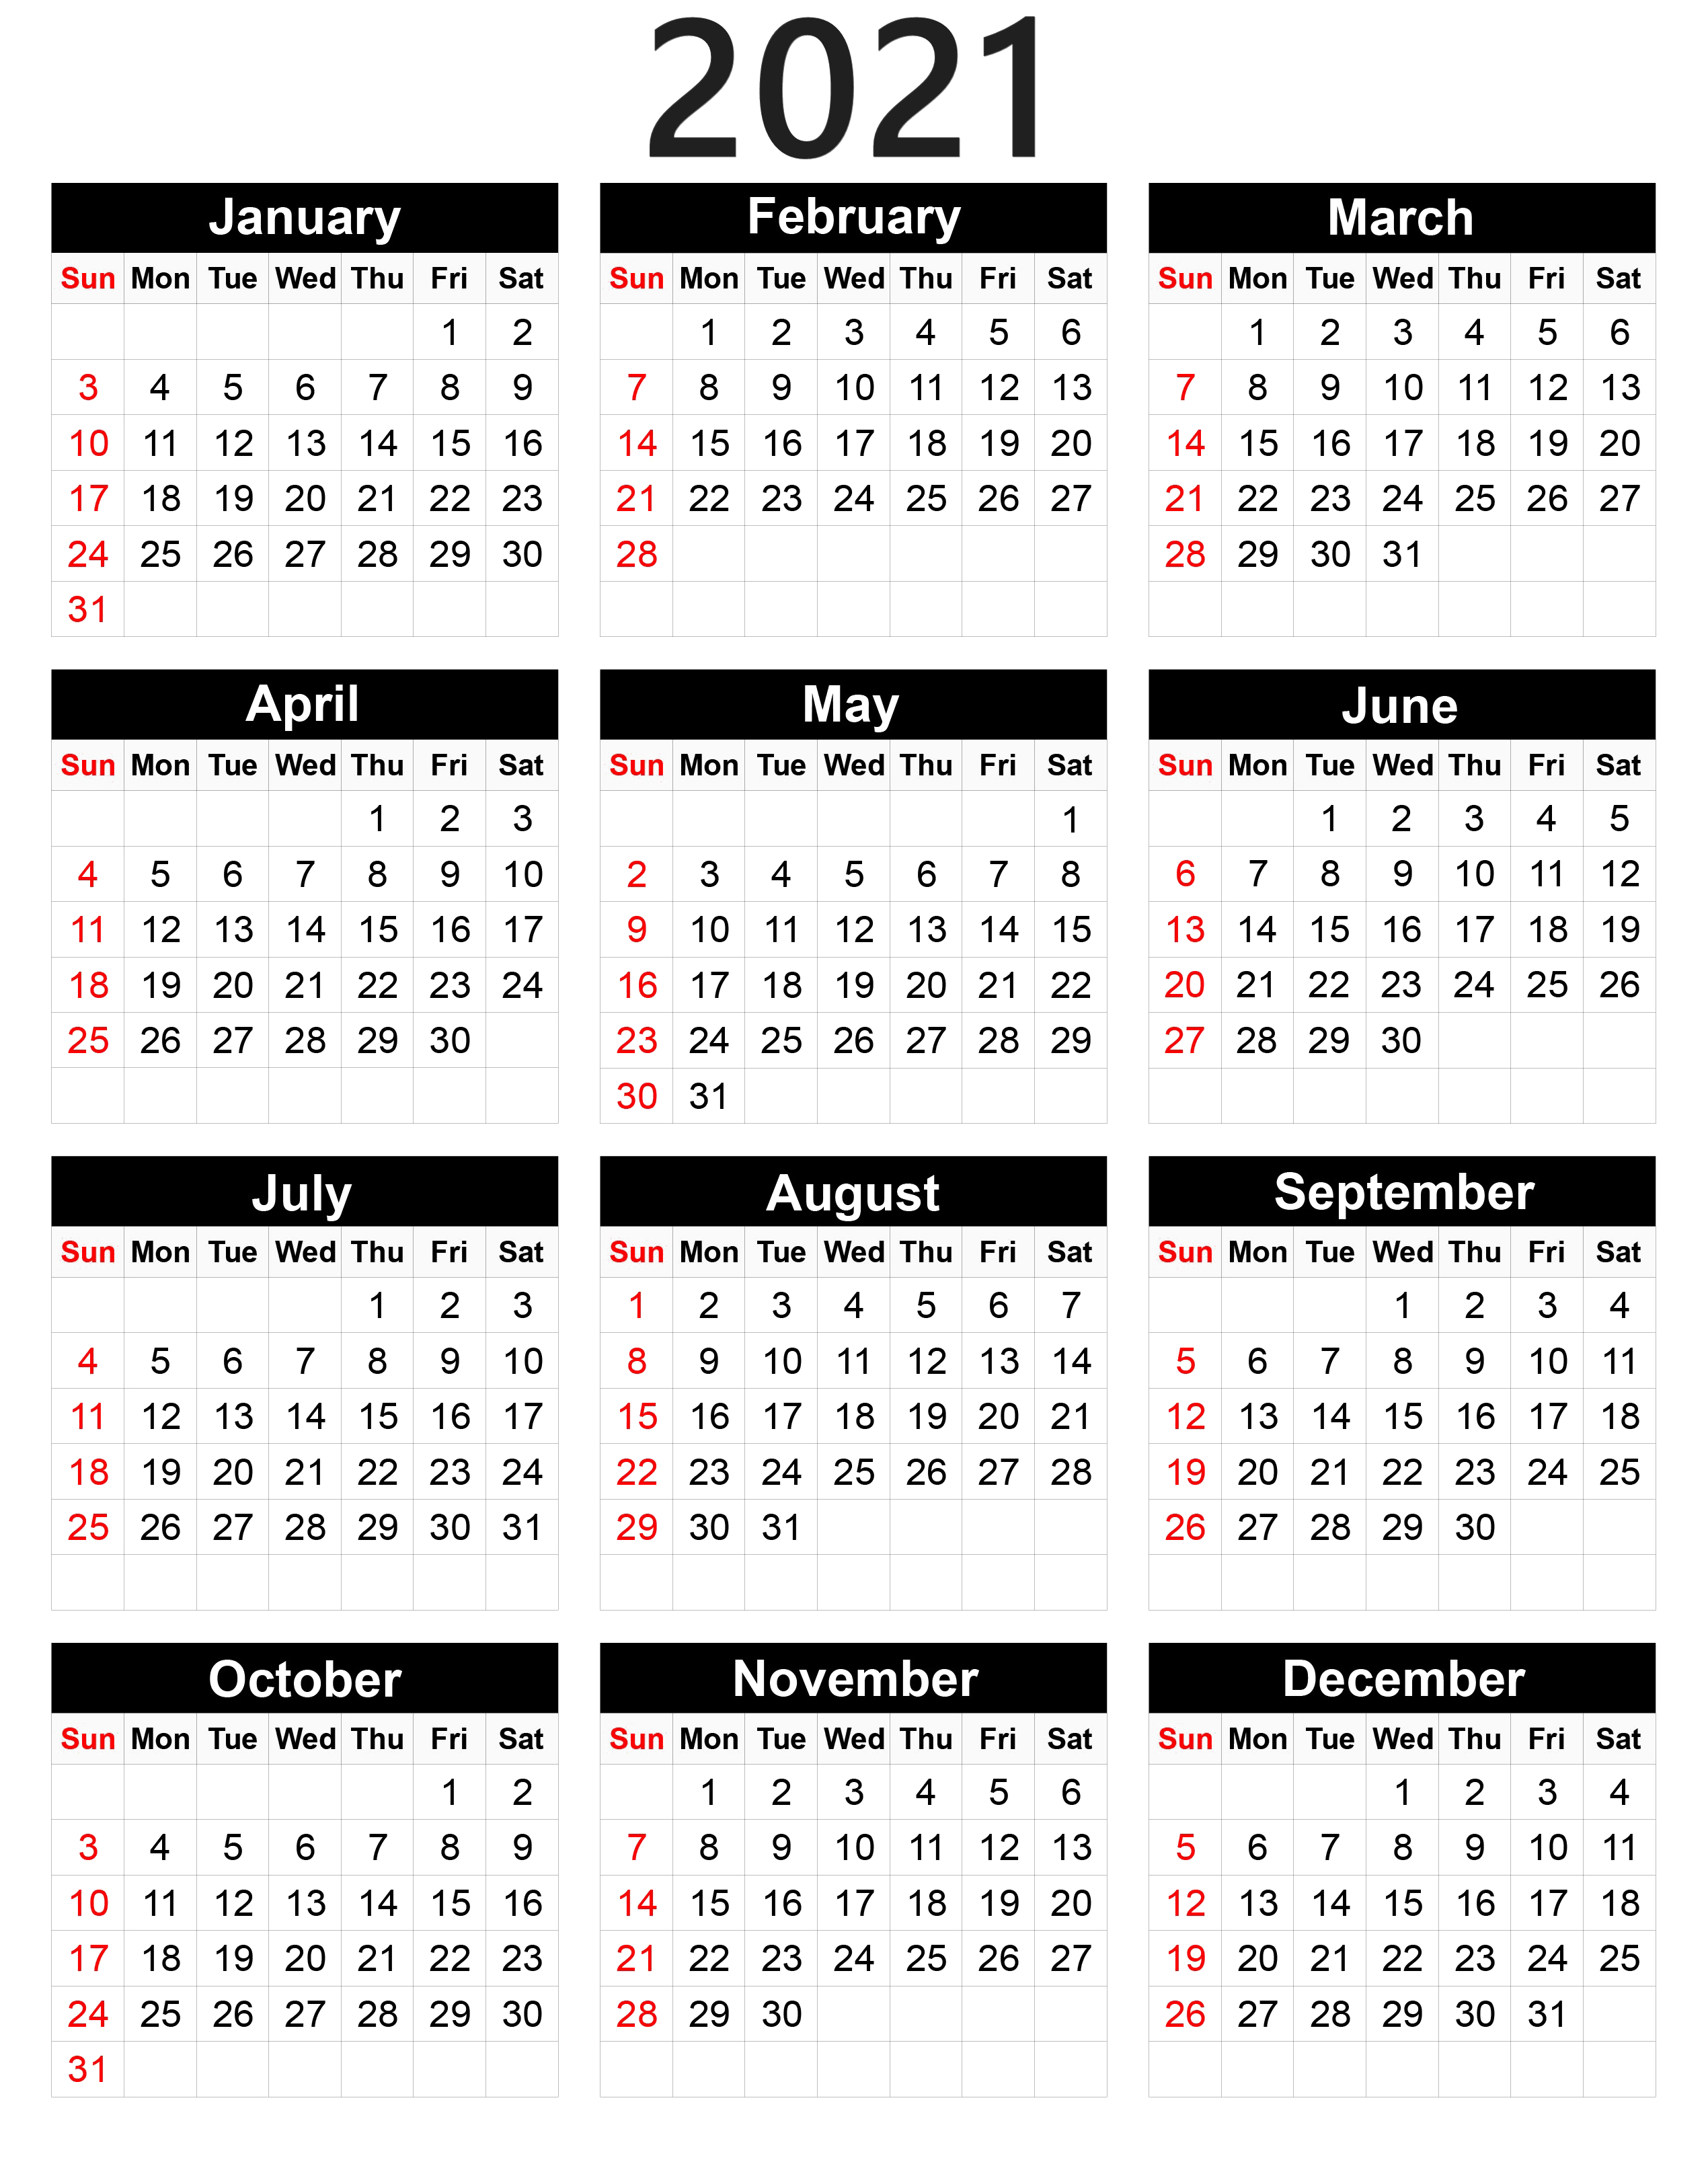 Calendar Of Year 2021 Wallpapers - Wallpaper Cave